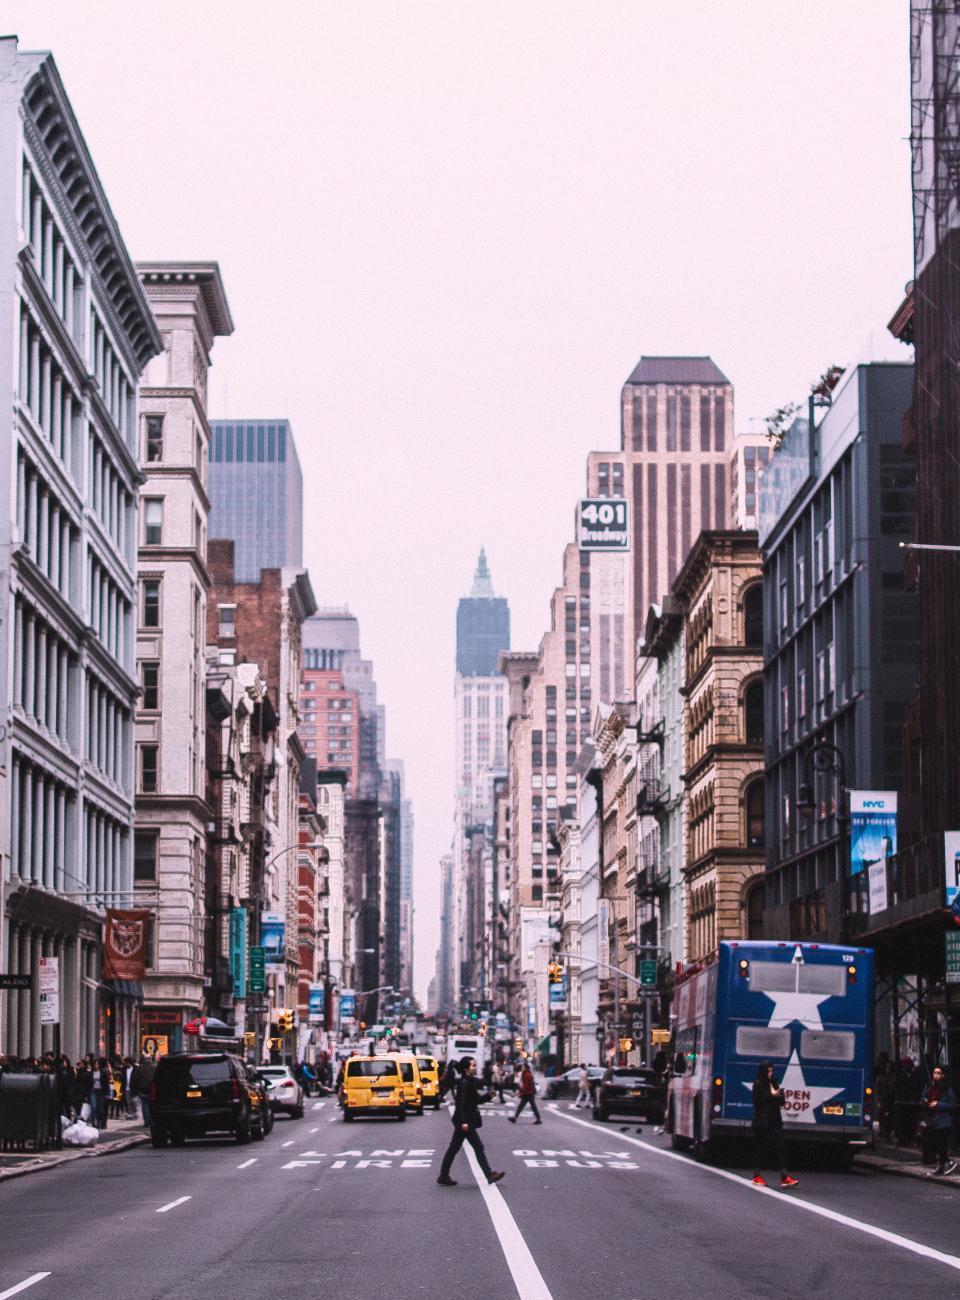 architecture, building, infrastructure, blue, sky, skyscraper, tower, city, urban, skyline, road, car, vehicle, lane, transportation, people, crowd, community